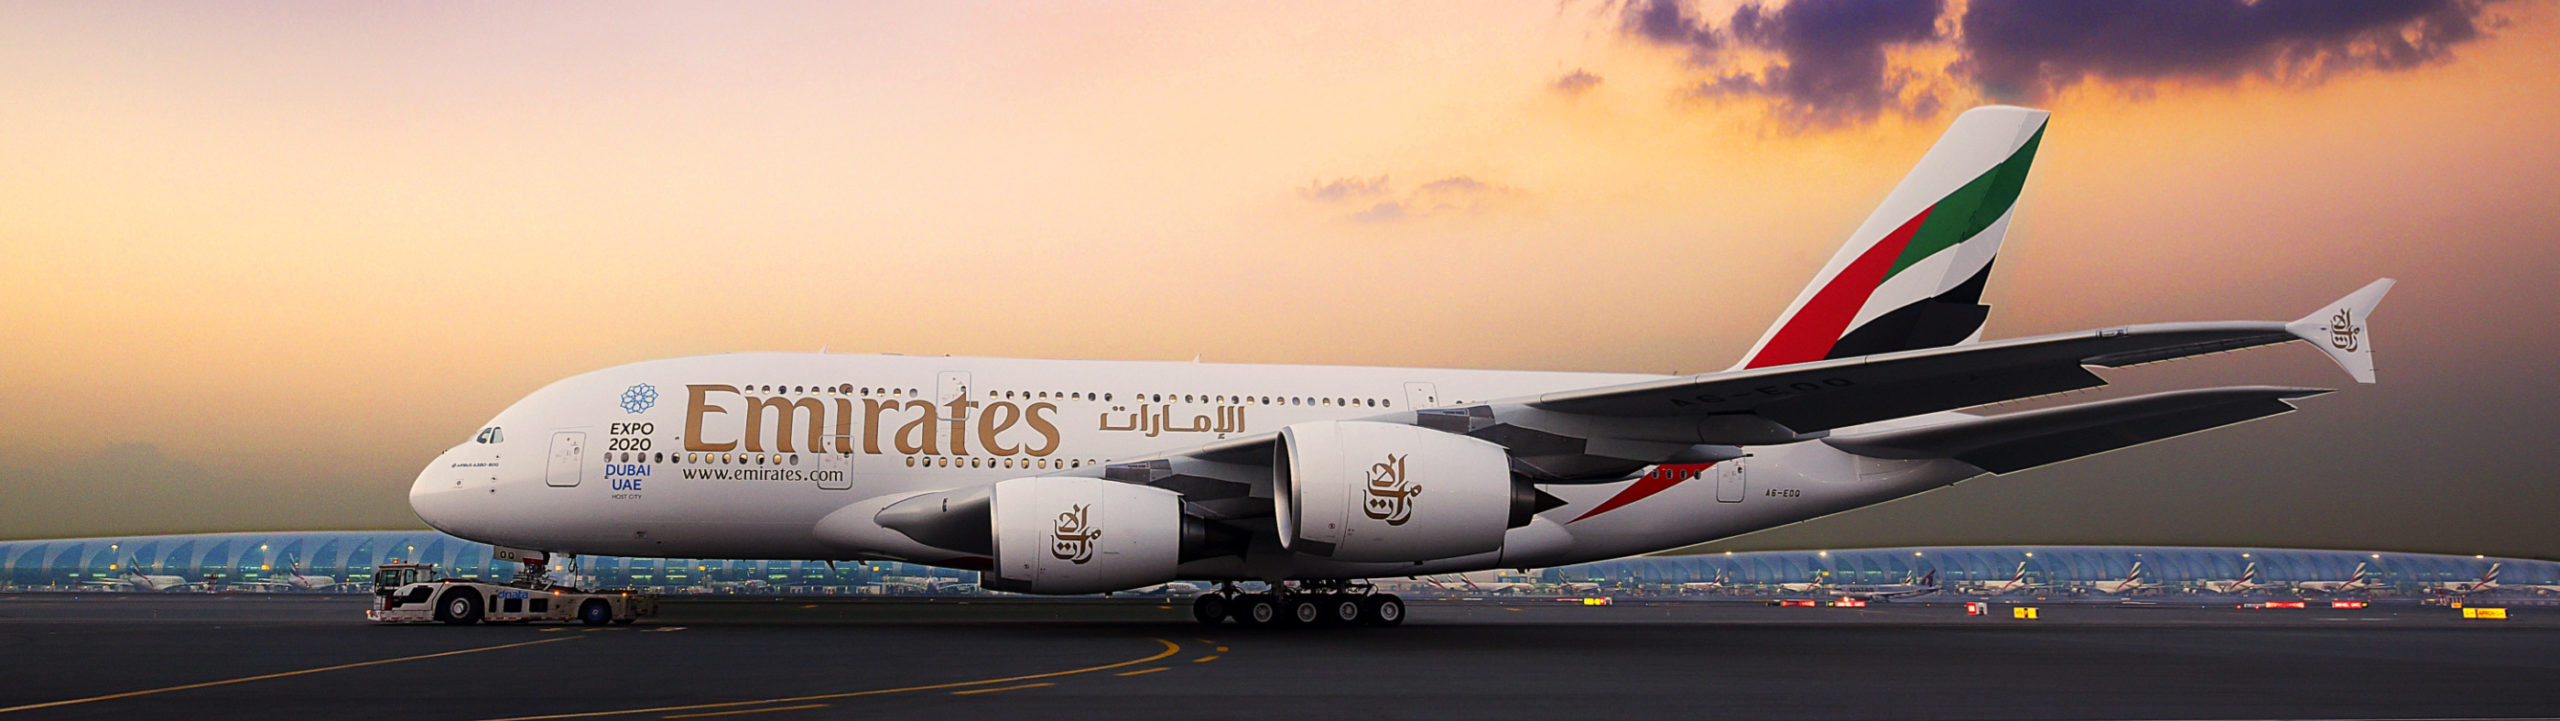 Emirates A380 Aéroport